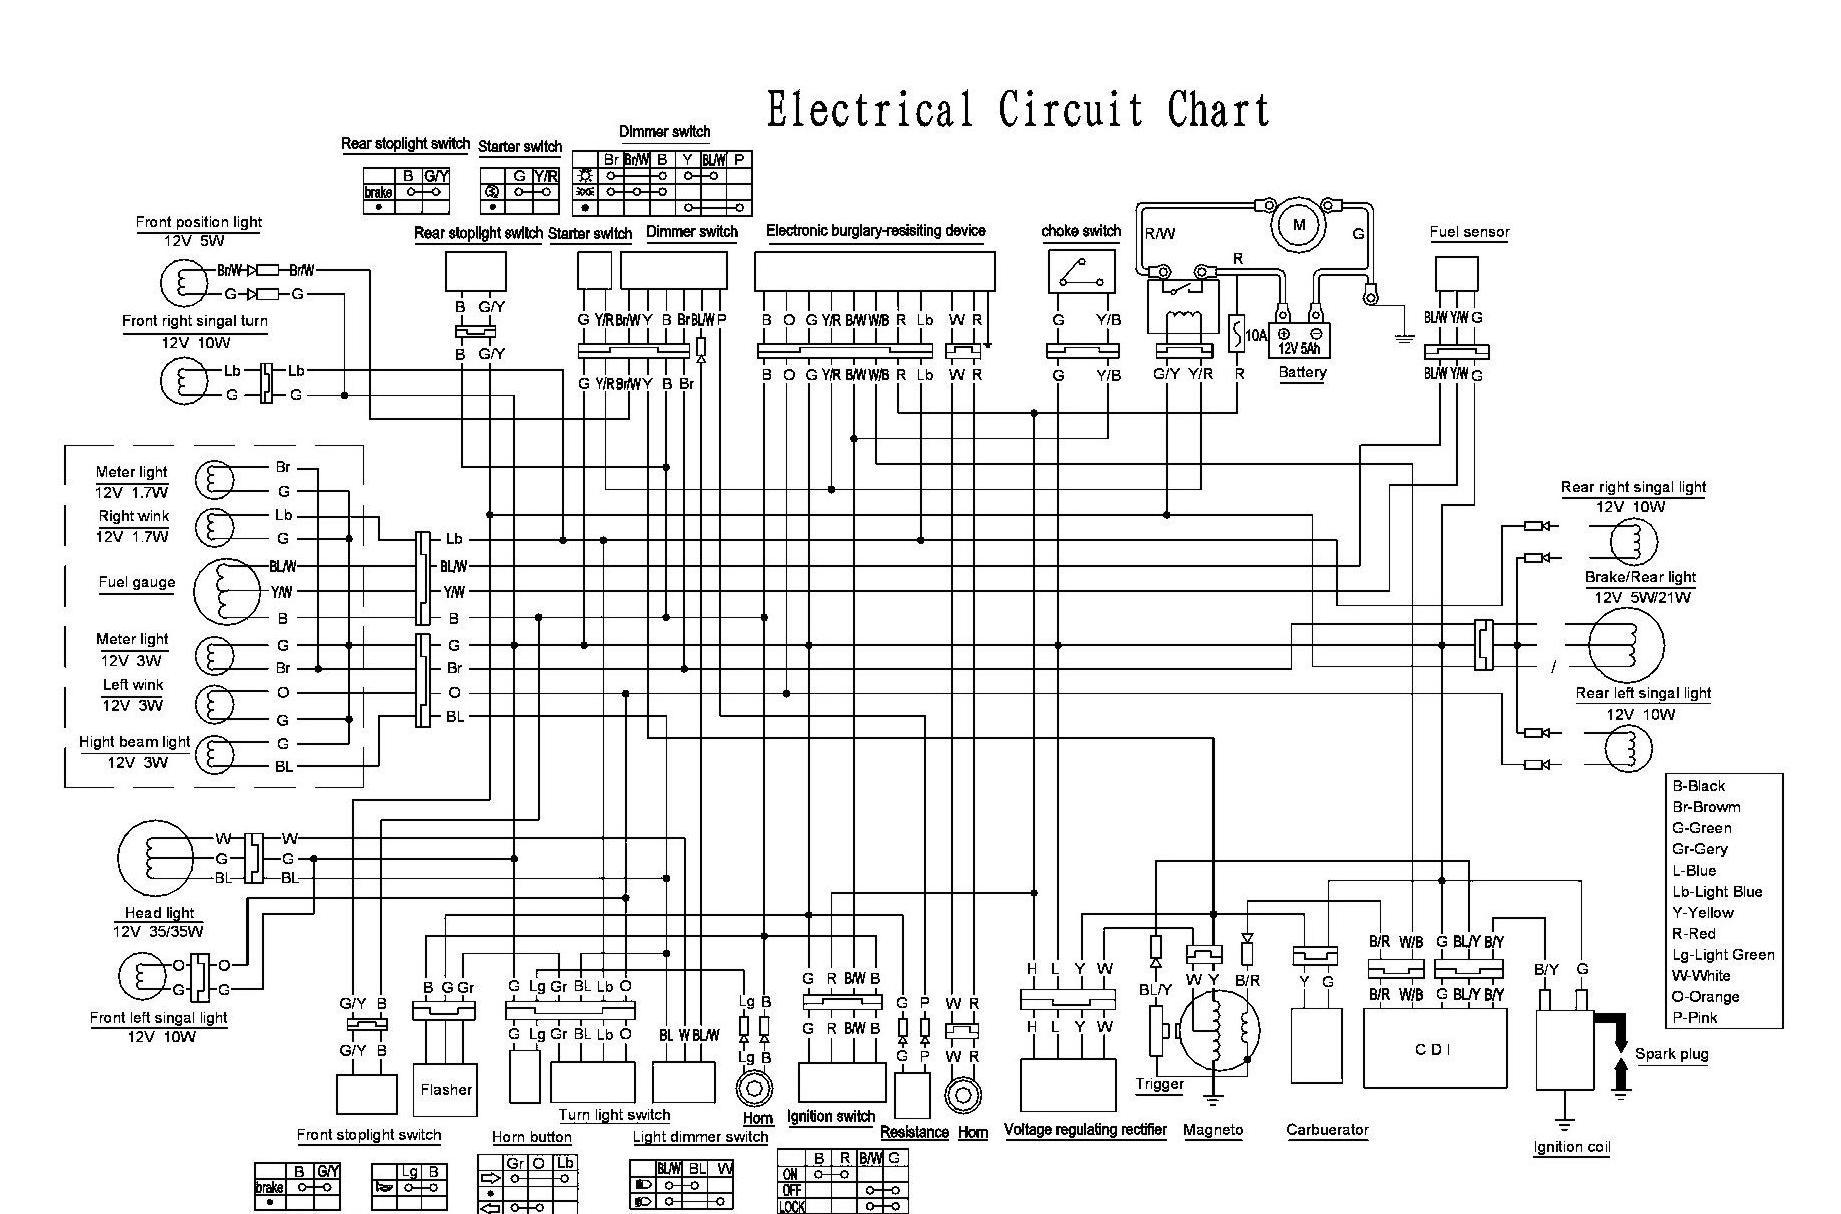 Loncin Wiring Diagram 50 200cc Atv